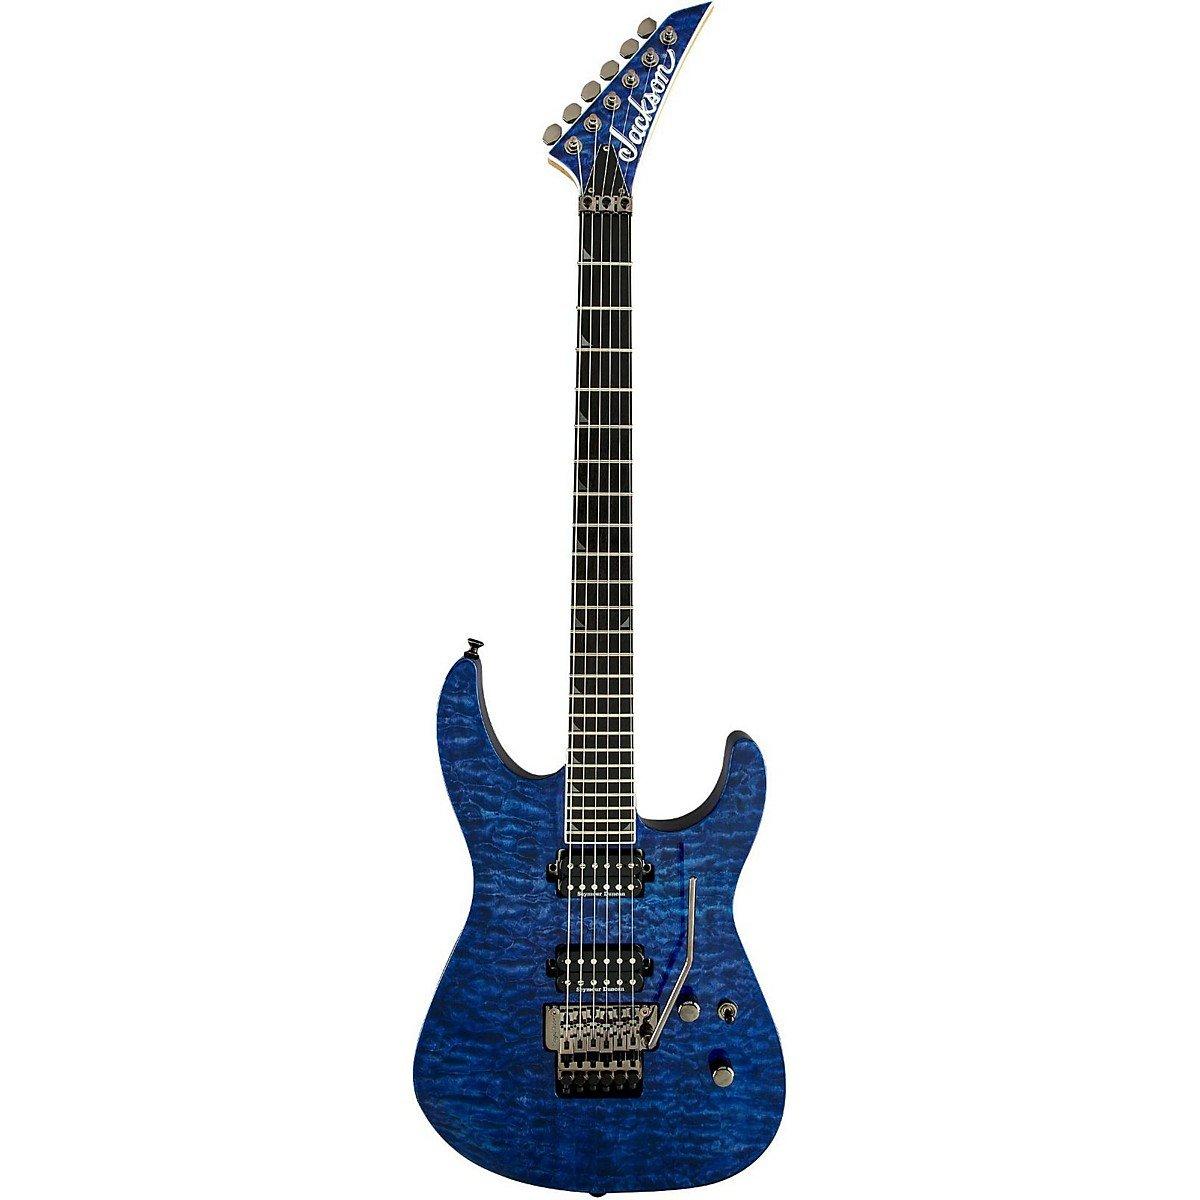 Jackson Pro Solista sl2q mAh - transparente azul: Amazon.es ...